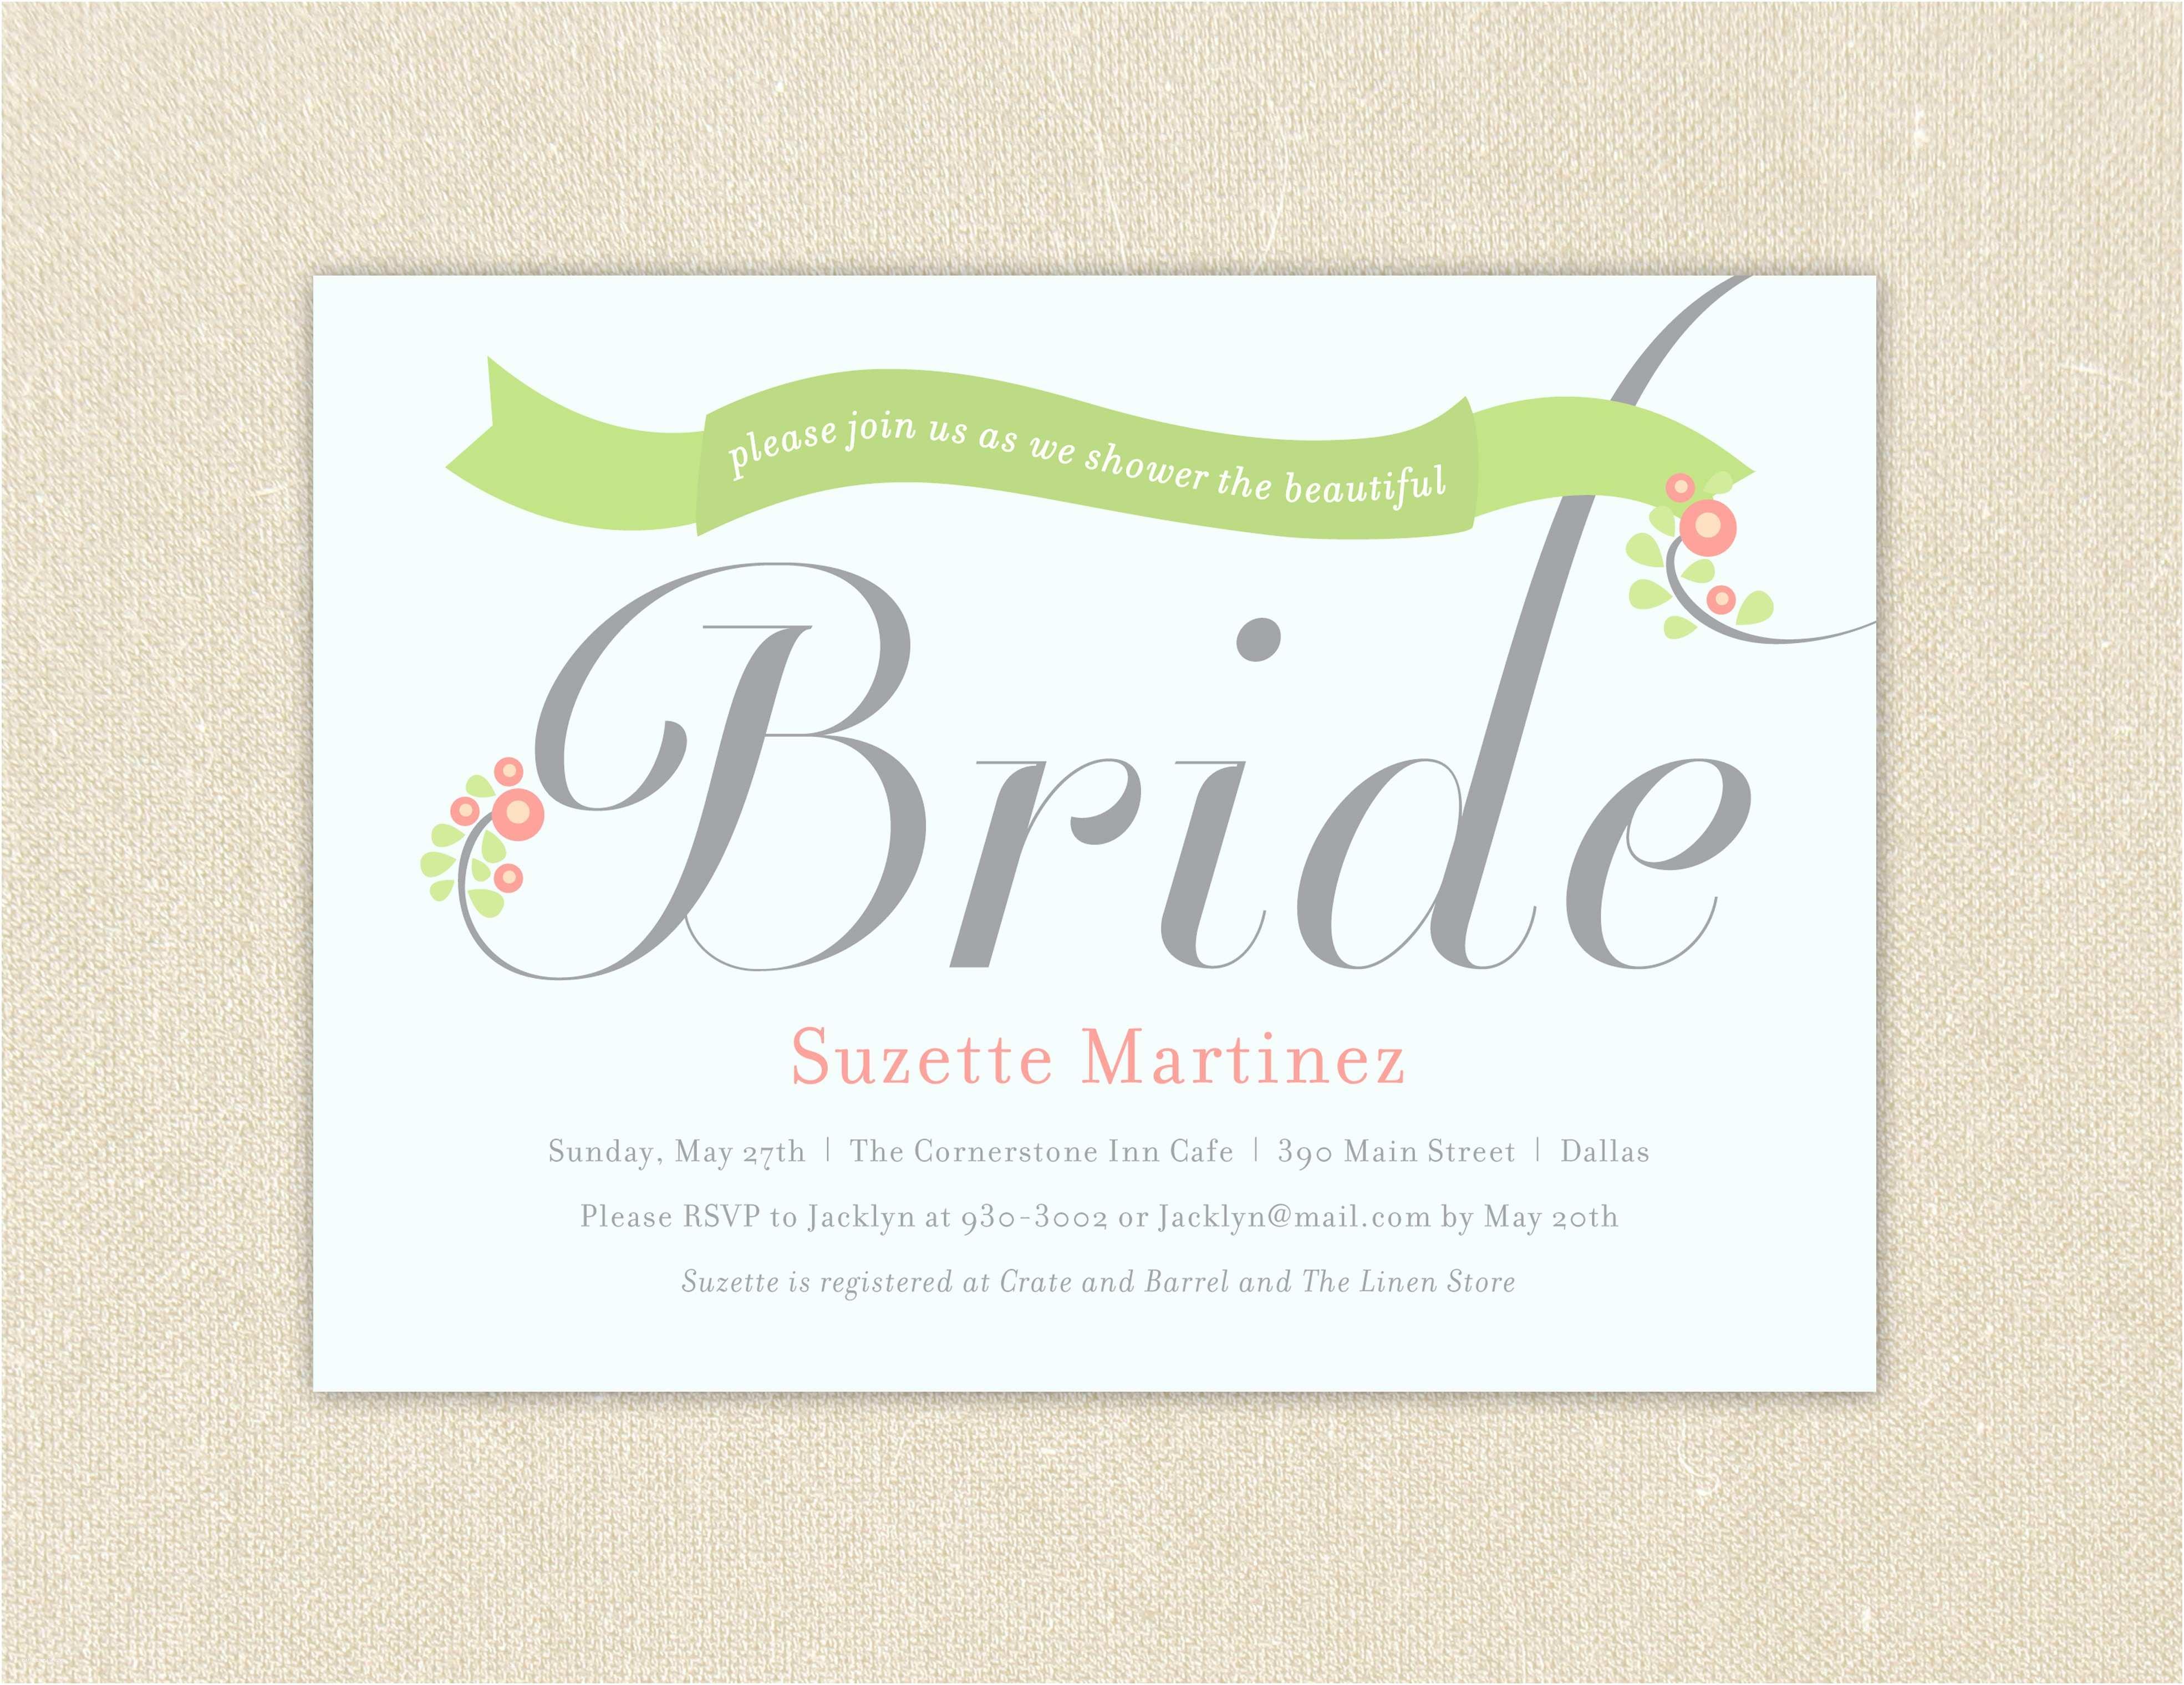 Invitations for Bridal Shower Free Printable Mason Jar Image